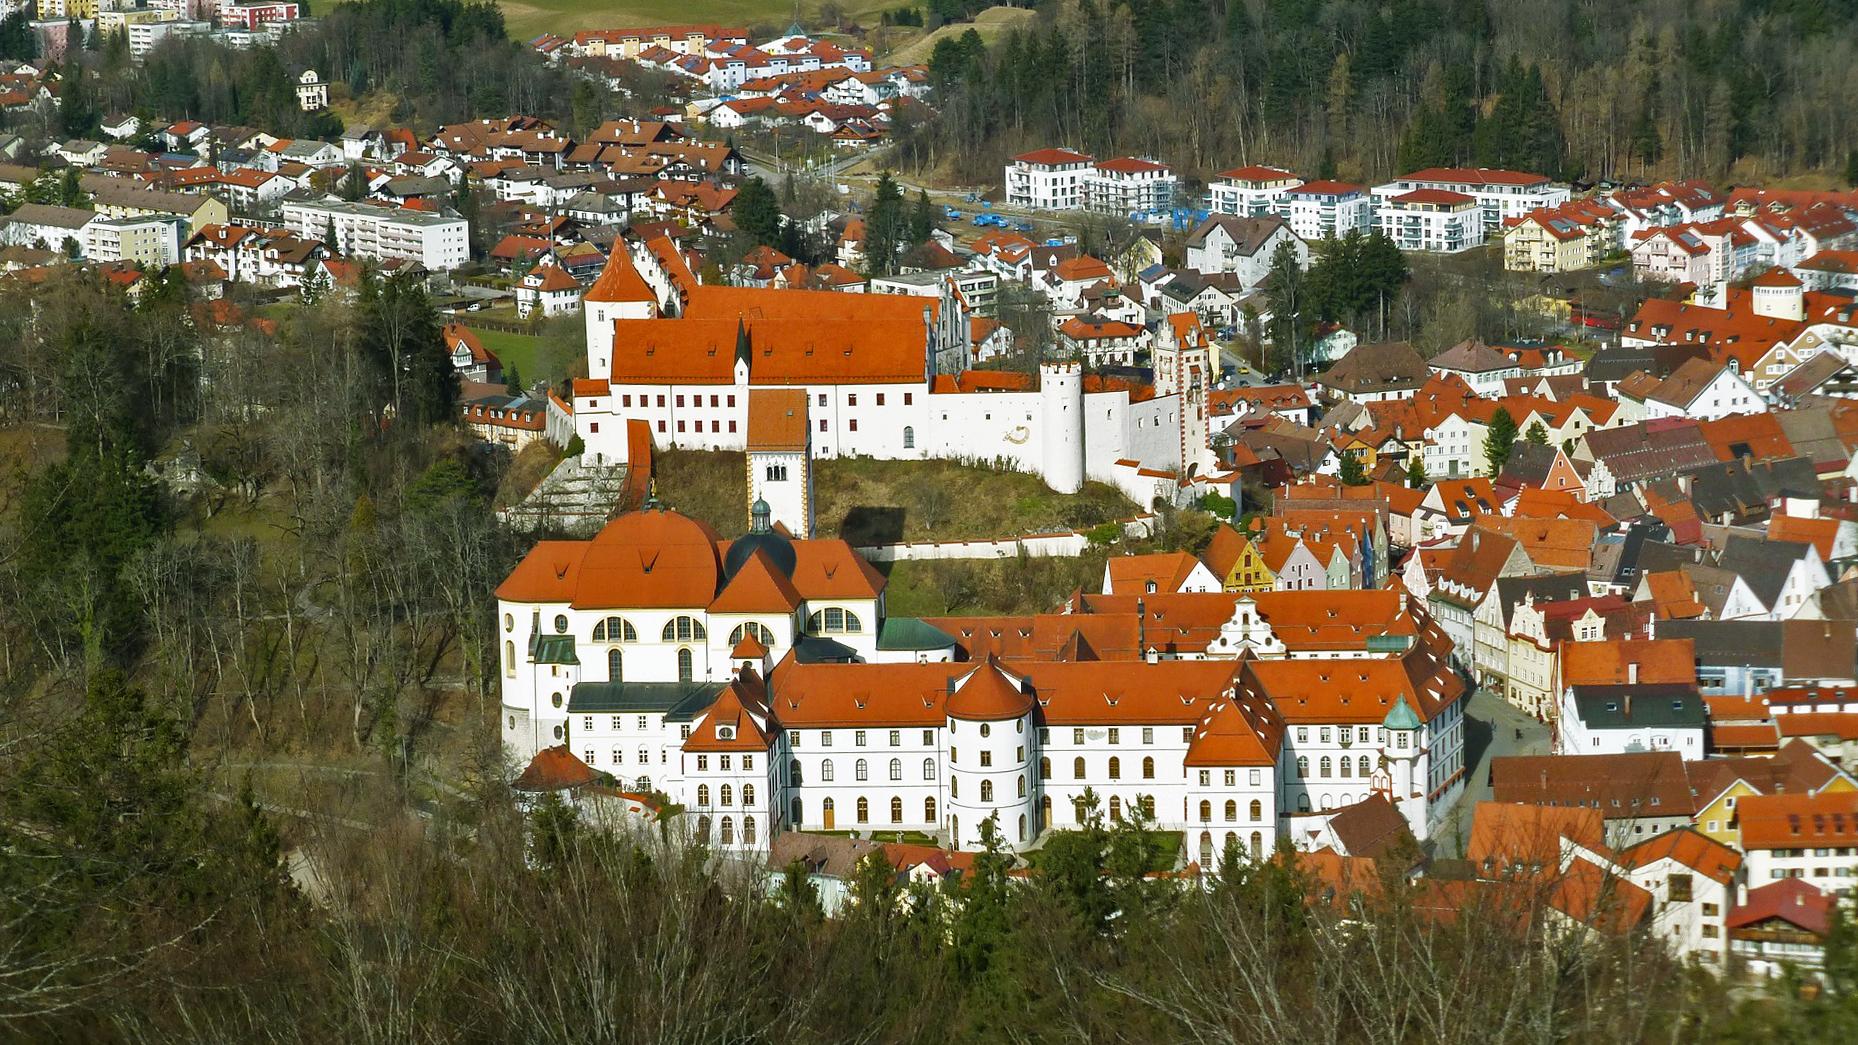 Vista aérea de Füssen, Alemanha